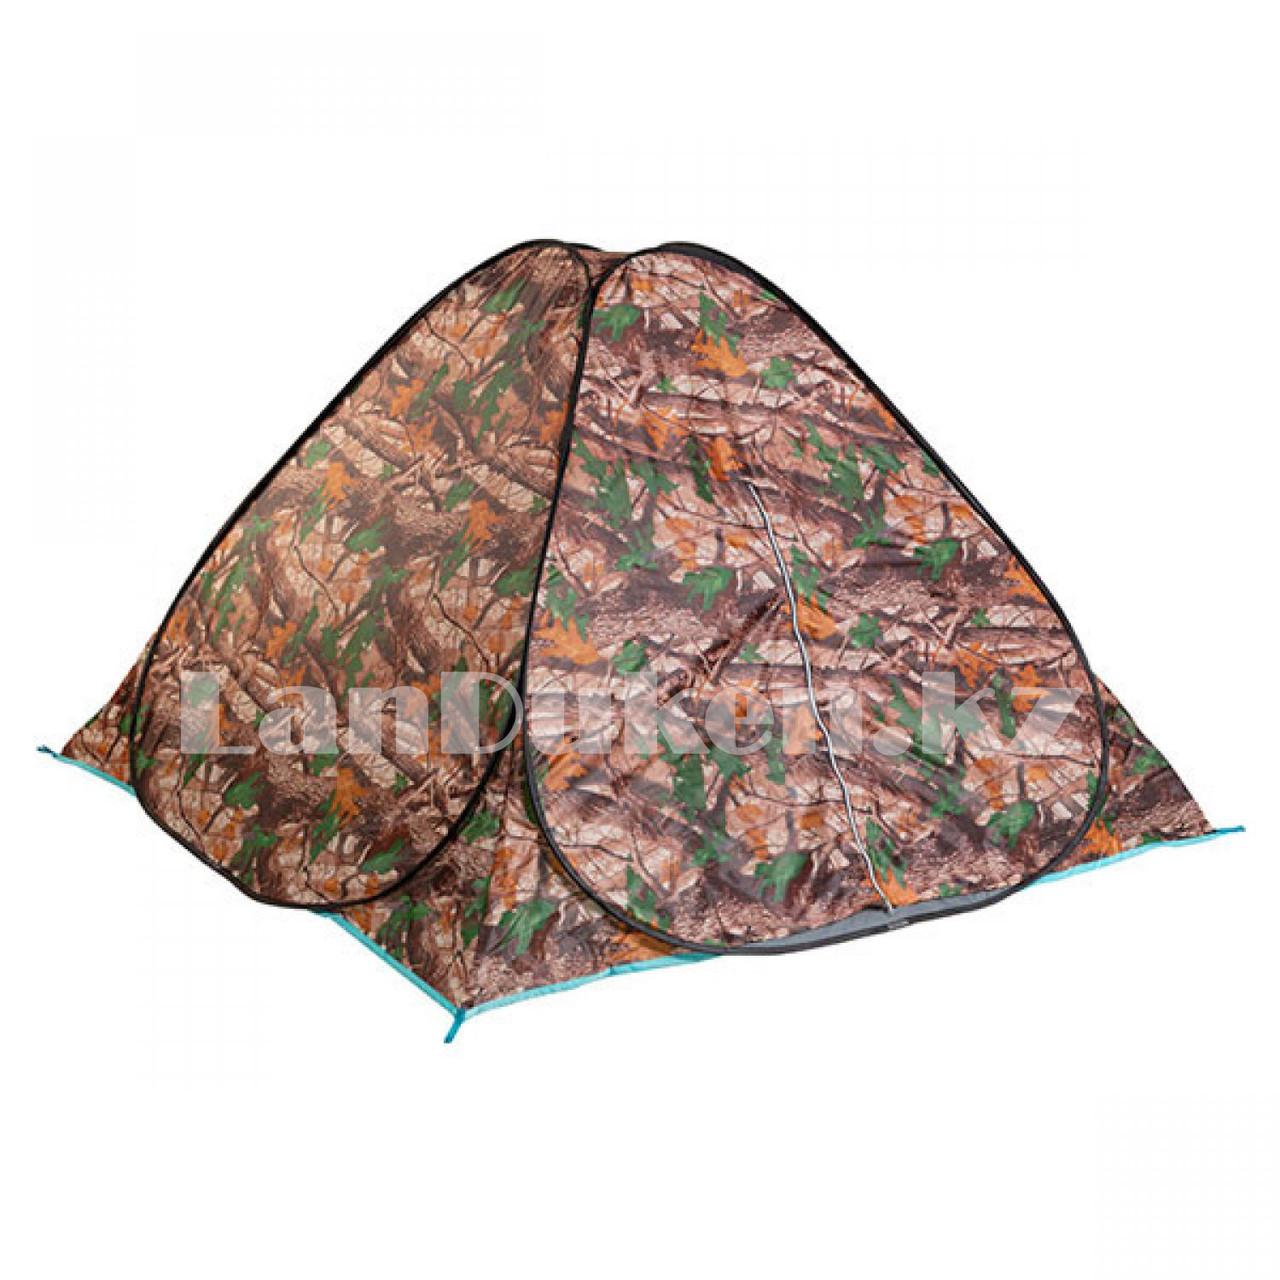 Палатка автомат 200* 200* 130 см - фото 6